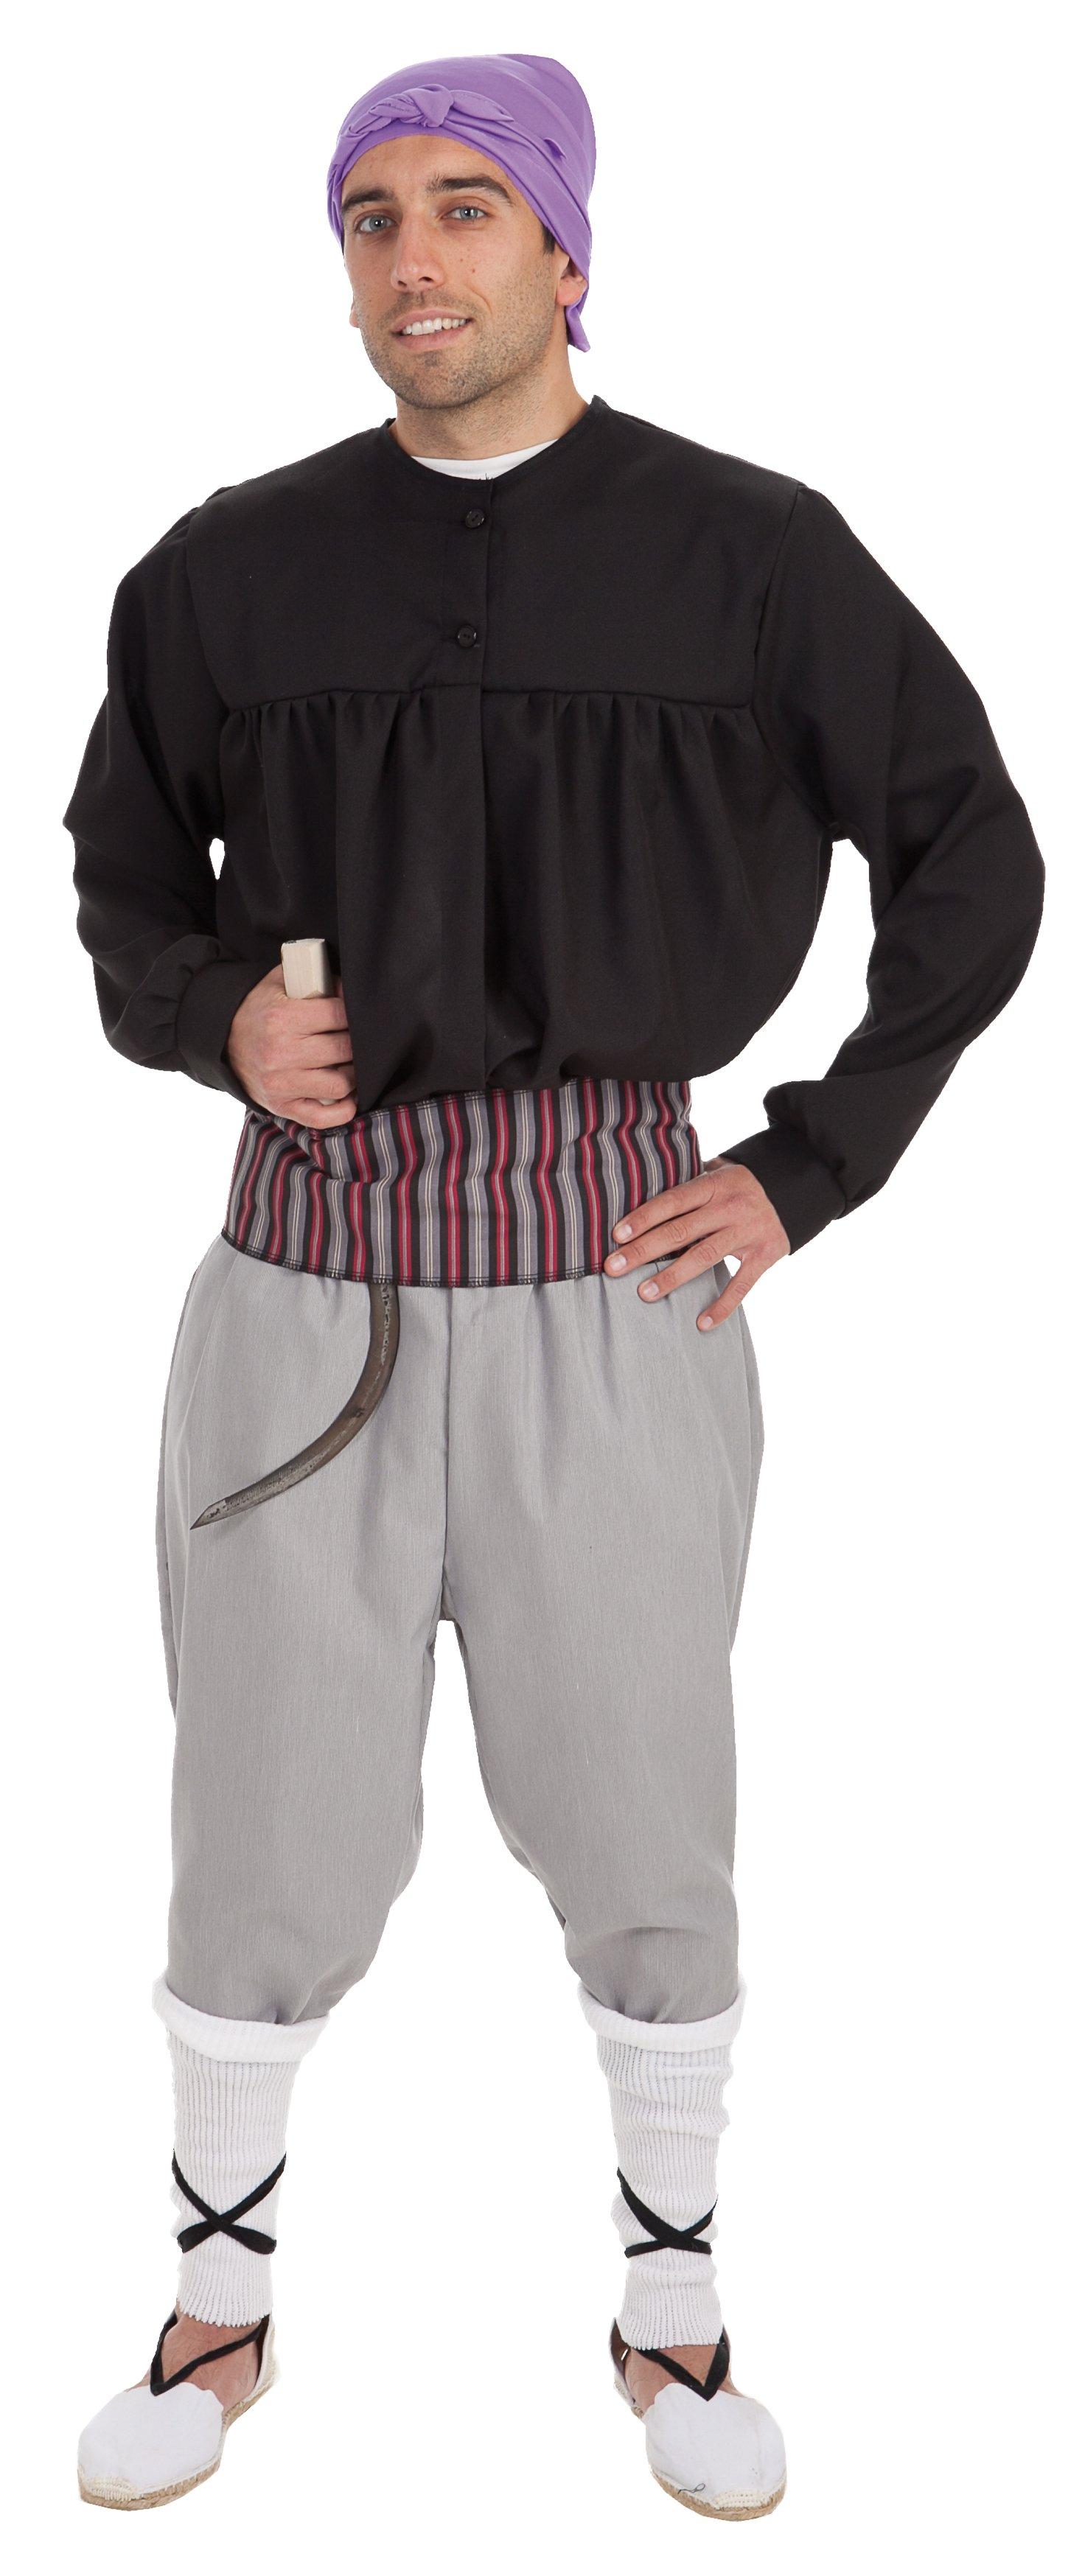 Disfraz de segador adulto